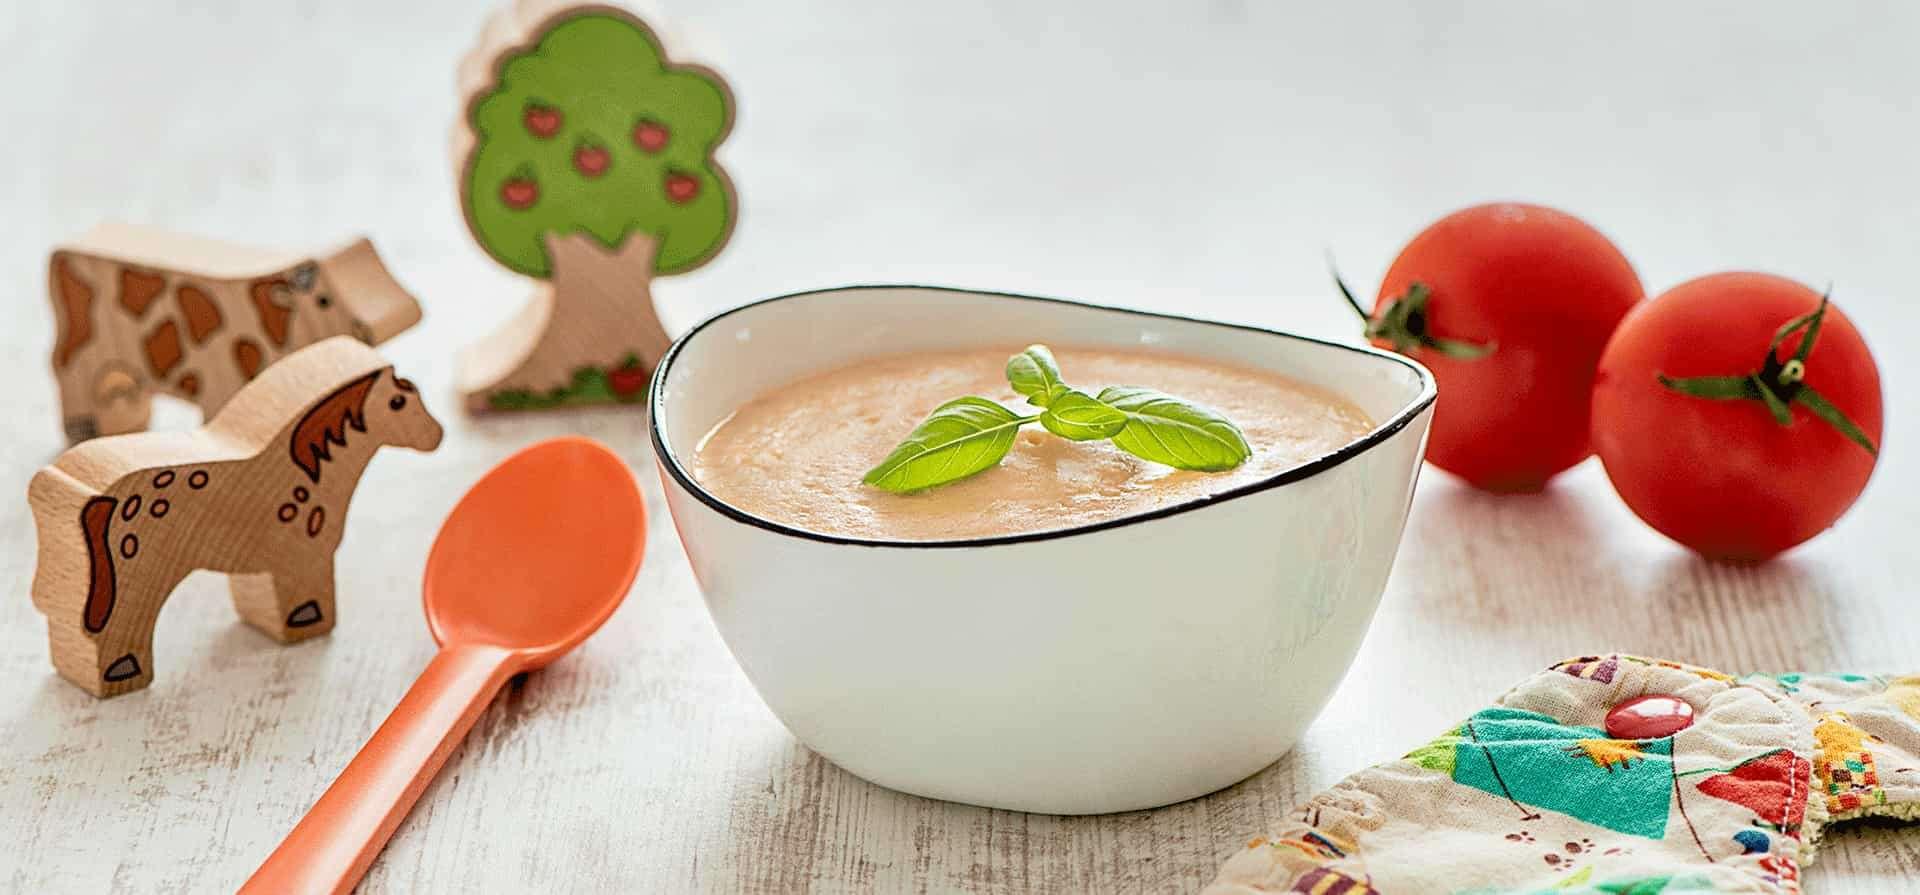 Recipe Rice Cream with Tomato and Basil